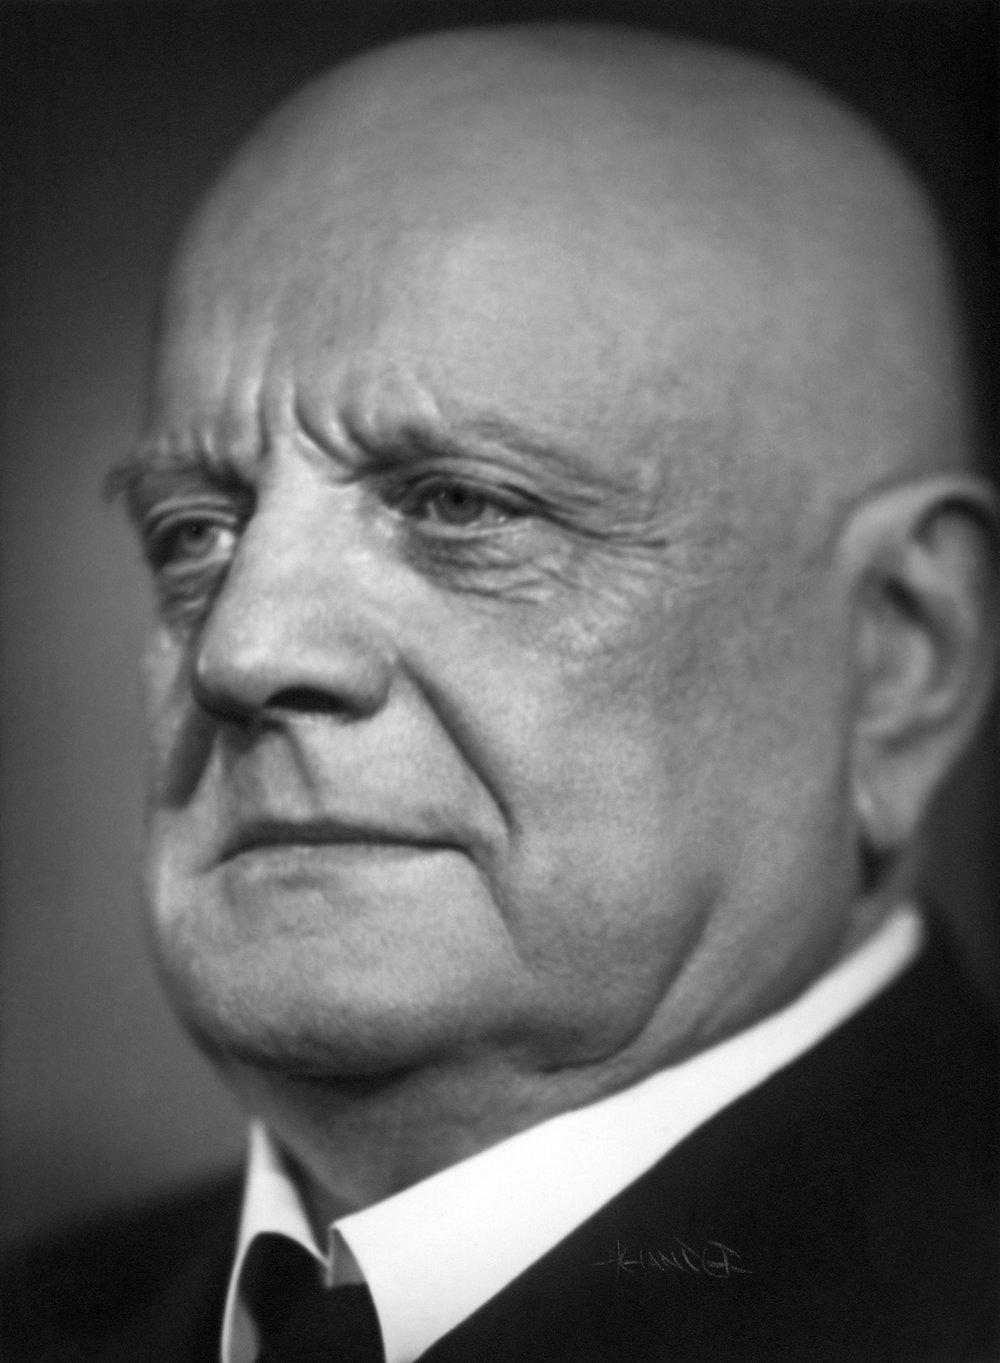 T7442_Jean-Sibelius-Finnish-composer-2.jpg